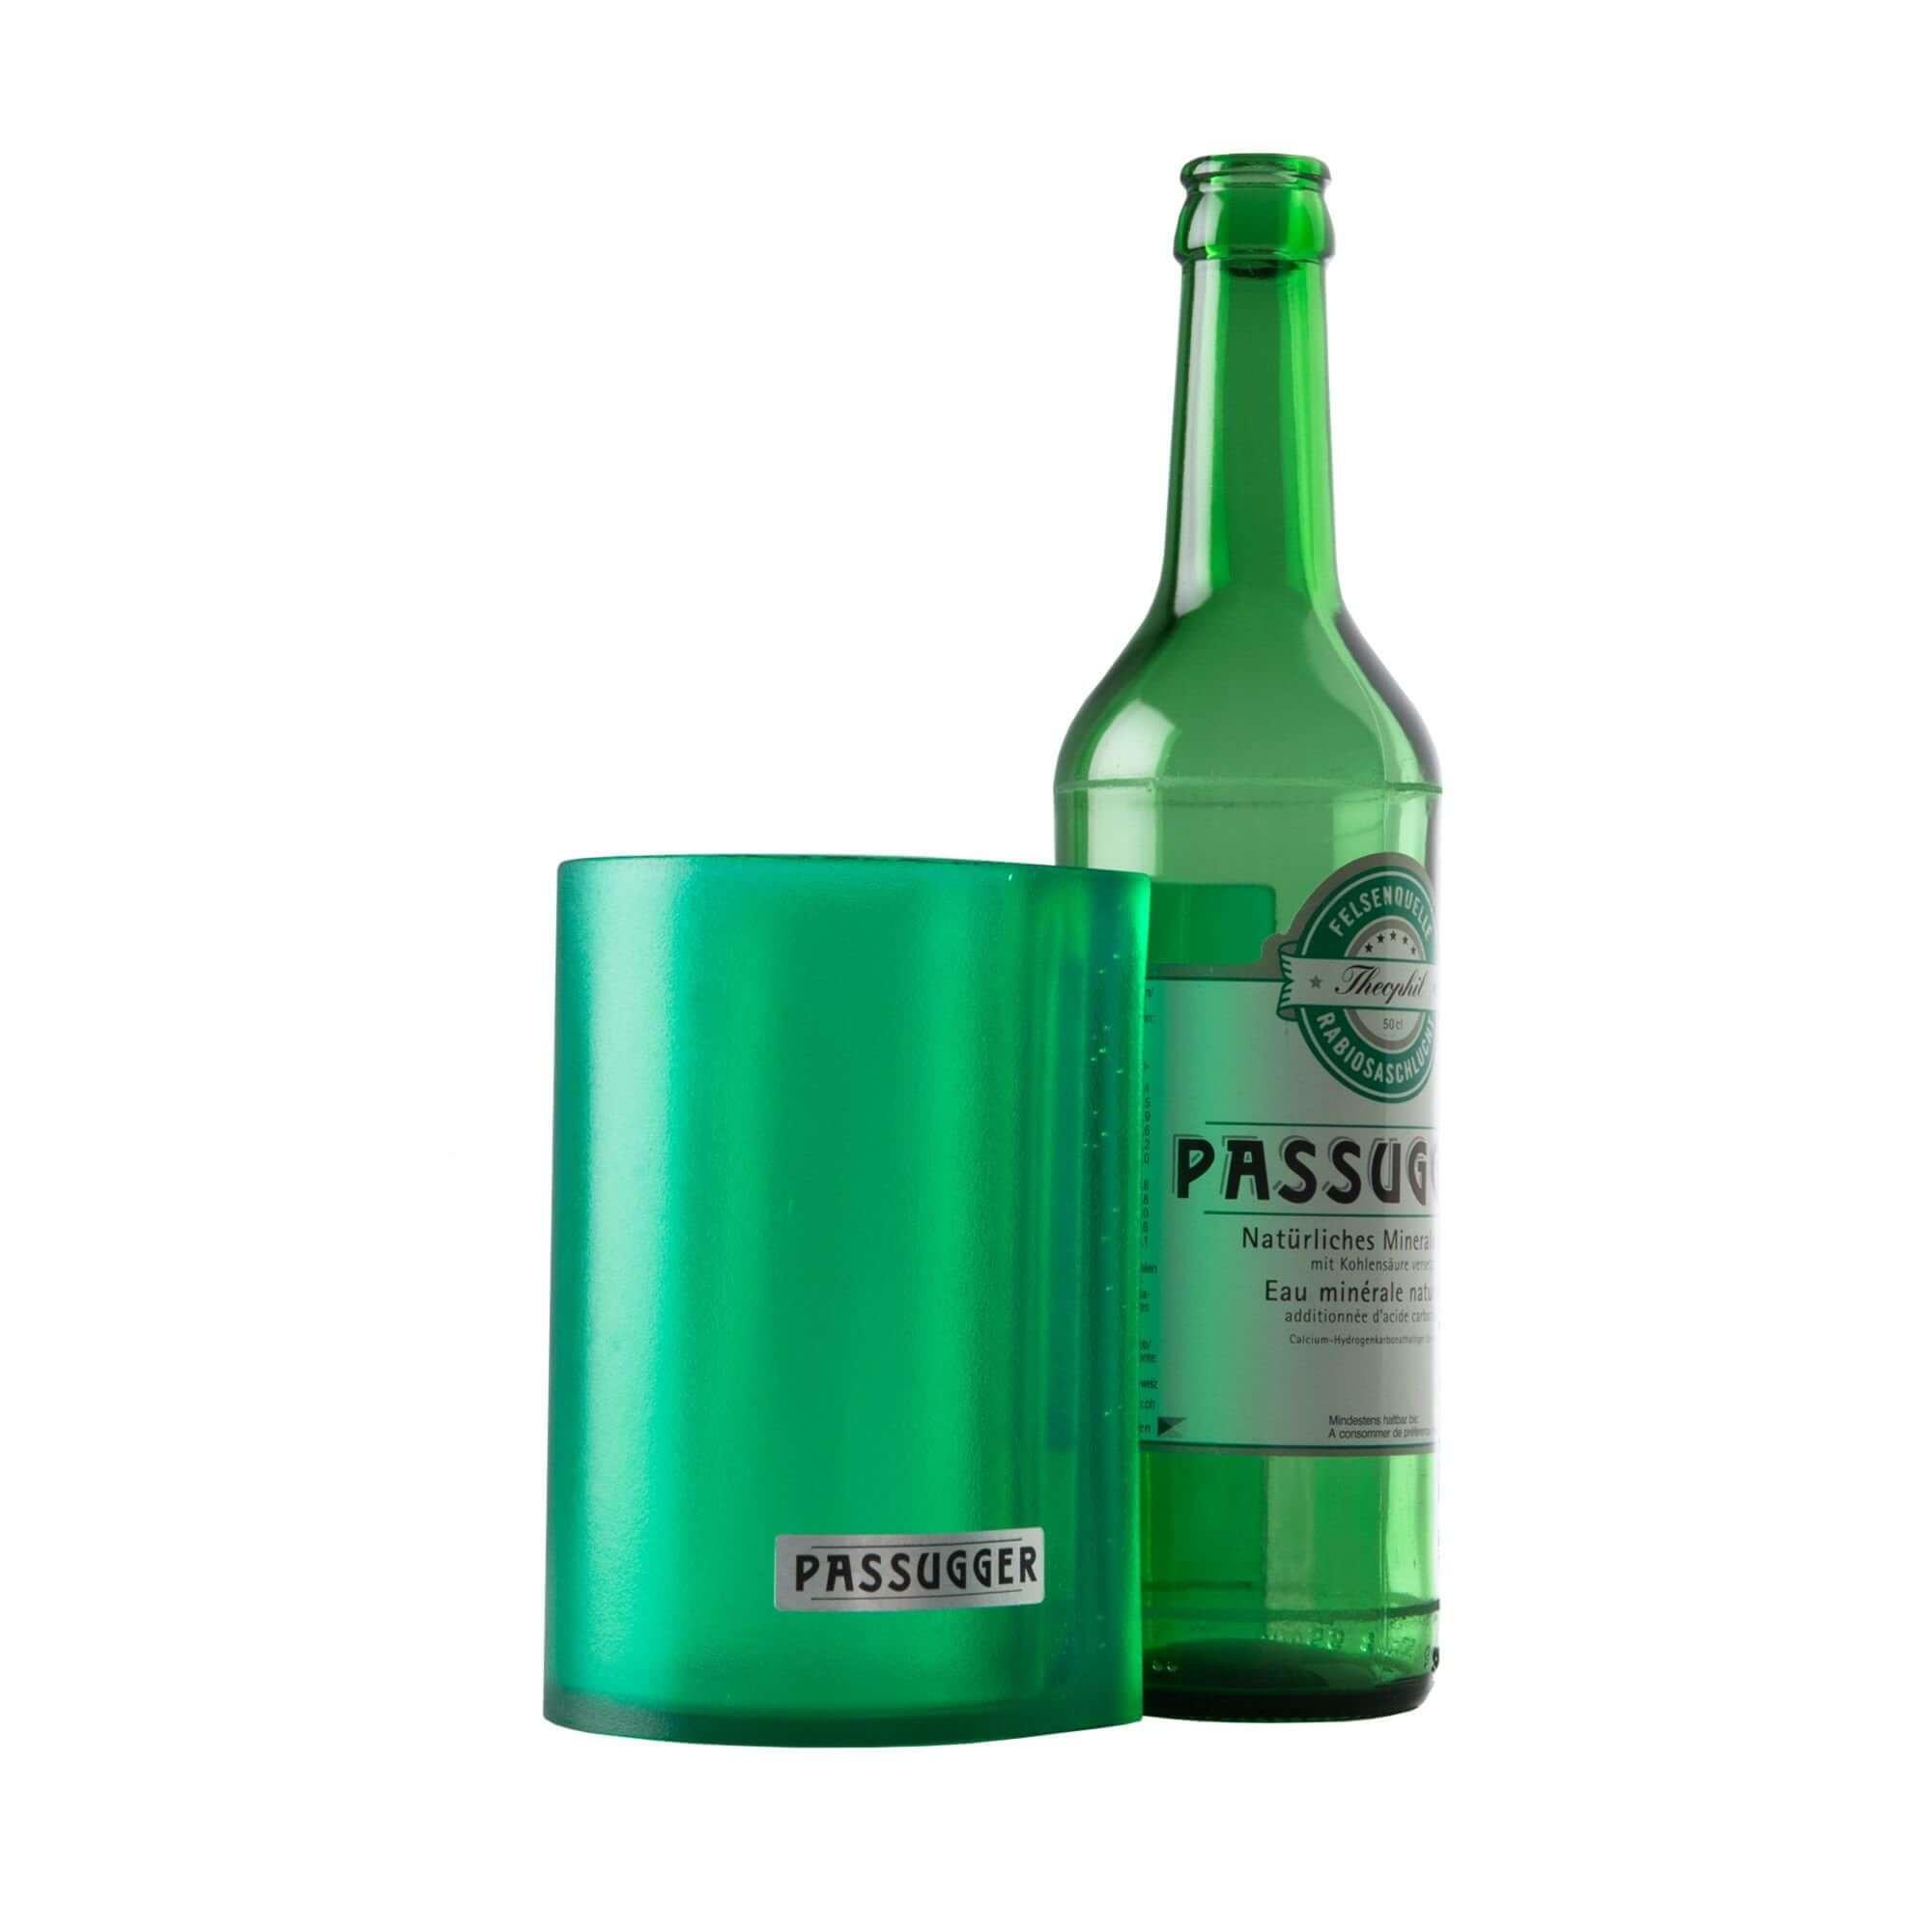 Acryline Display promotionnel verre acrylique promotion sales decoration cadeau individuell